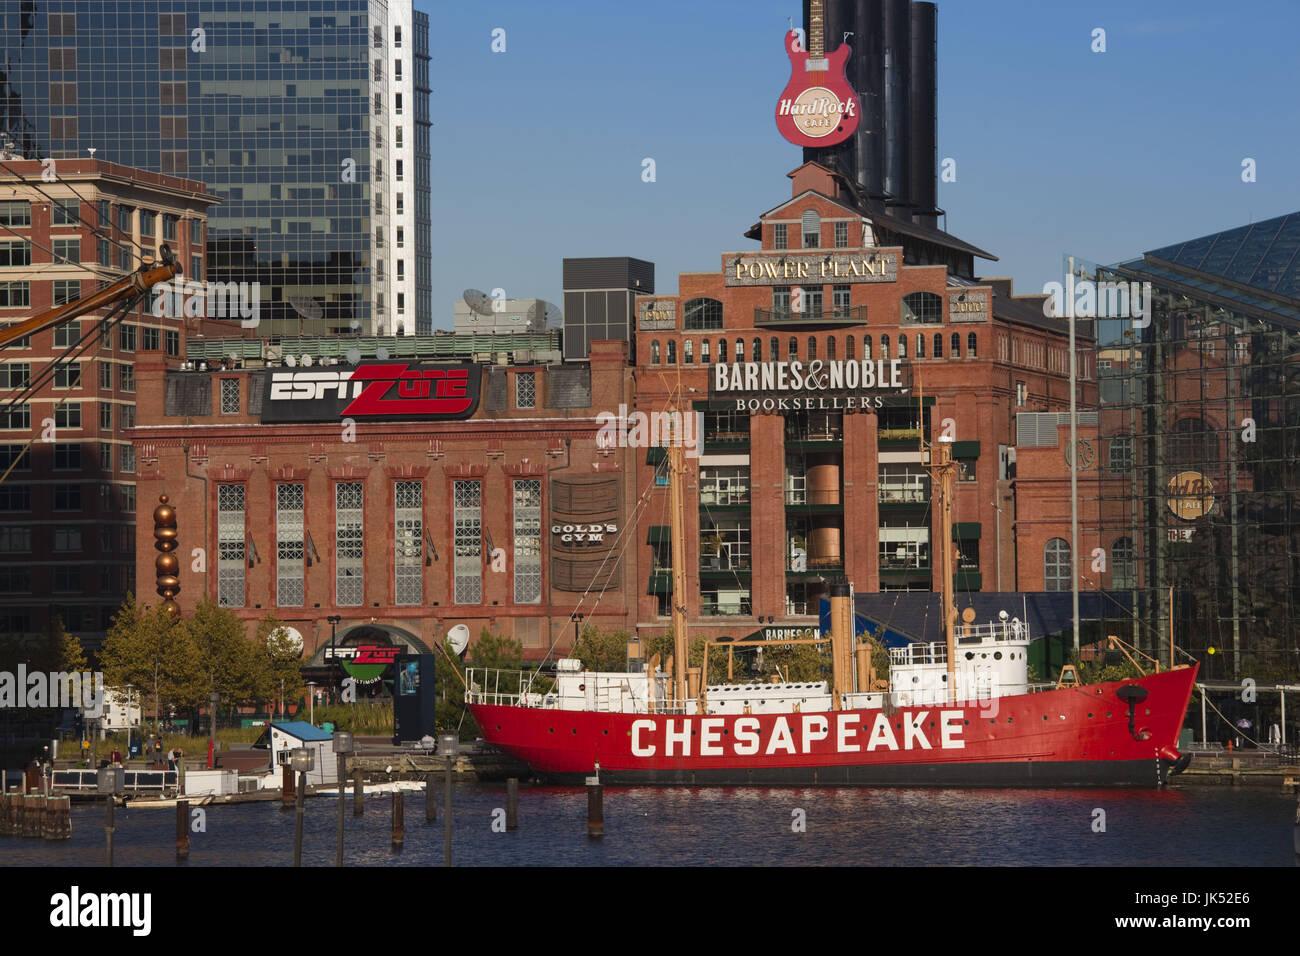 USA, Maryland, Baltimore, Inner Harbor, Powerplant Mall and Lightship Chesapeake - Stock Image